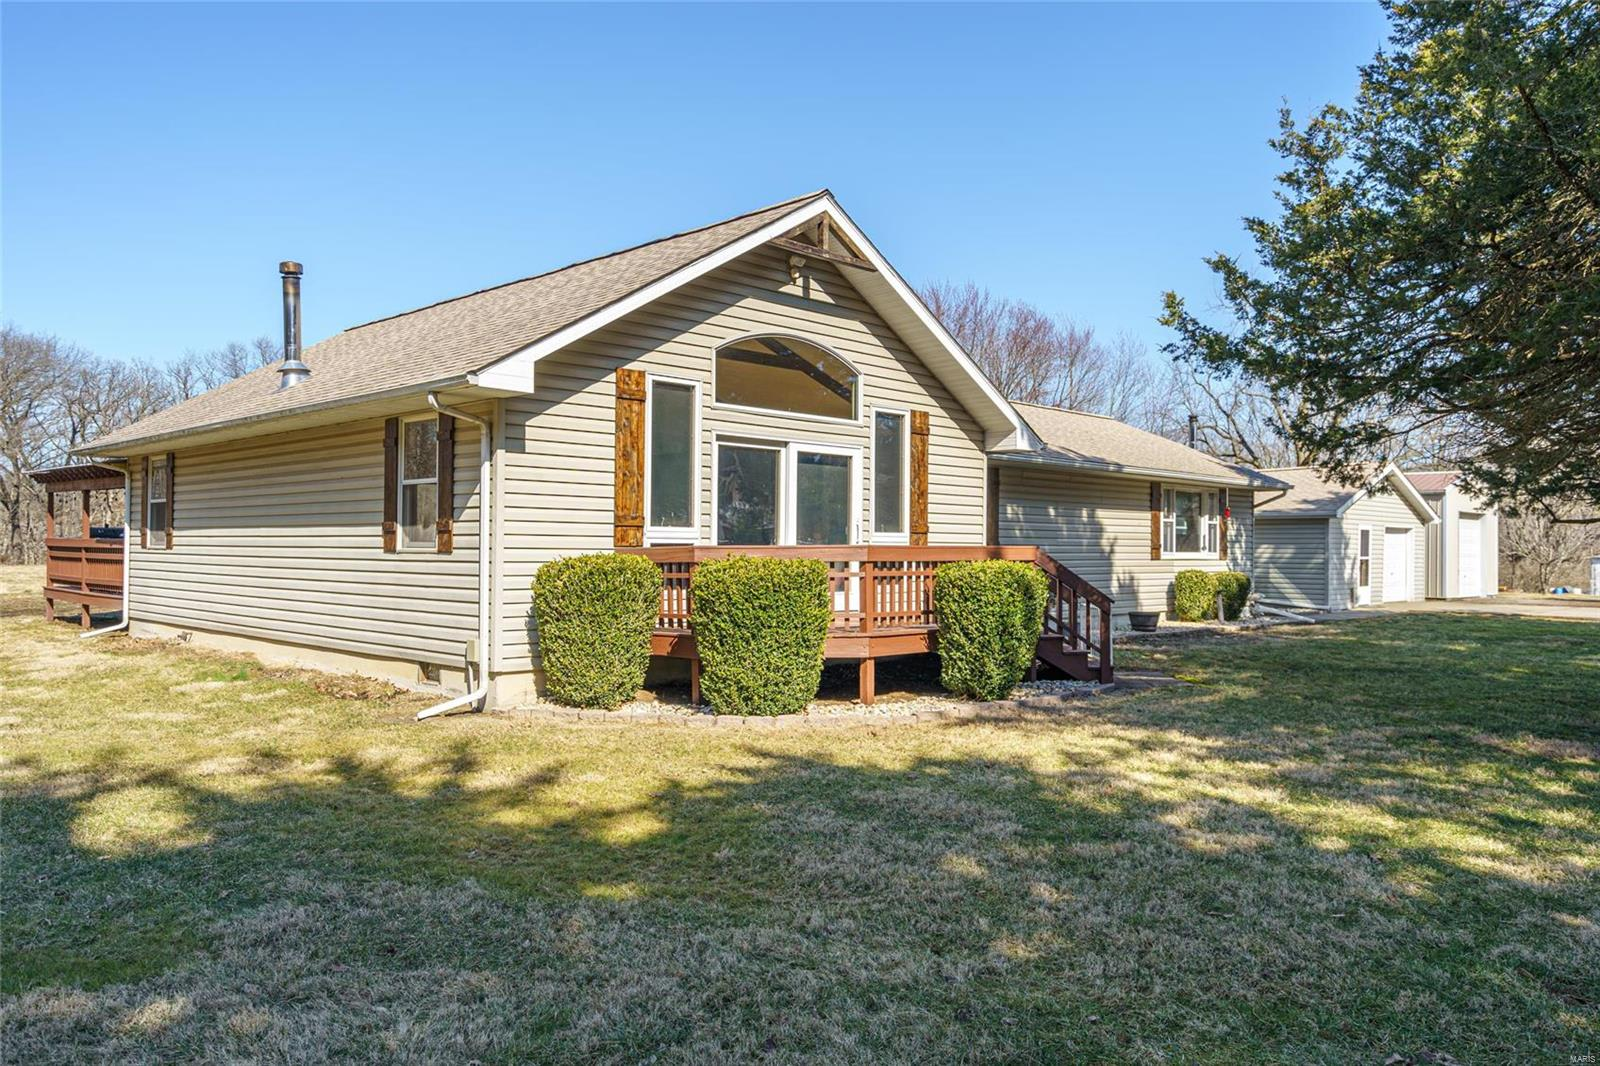 126 Arrowhead Trail Property Photo - Litchfield, IL real estate listing